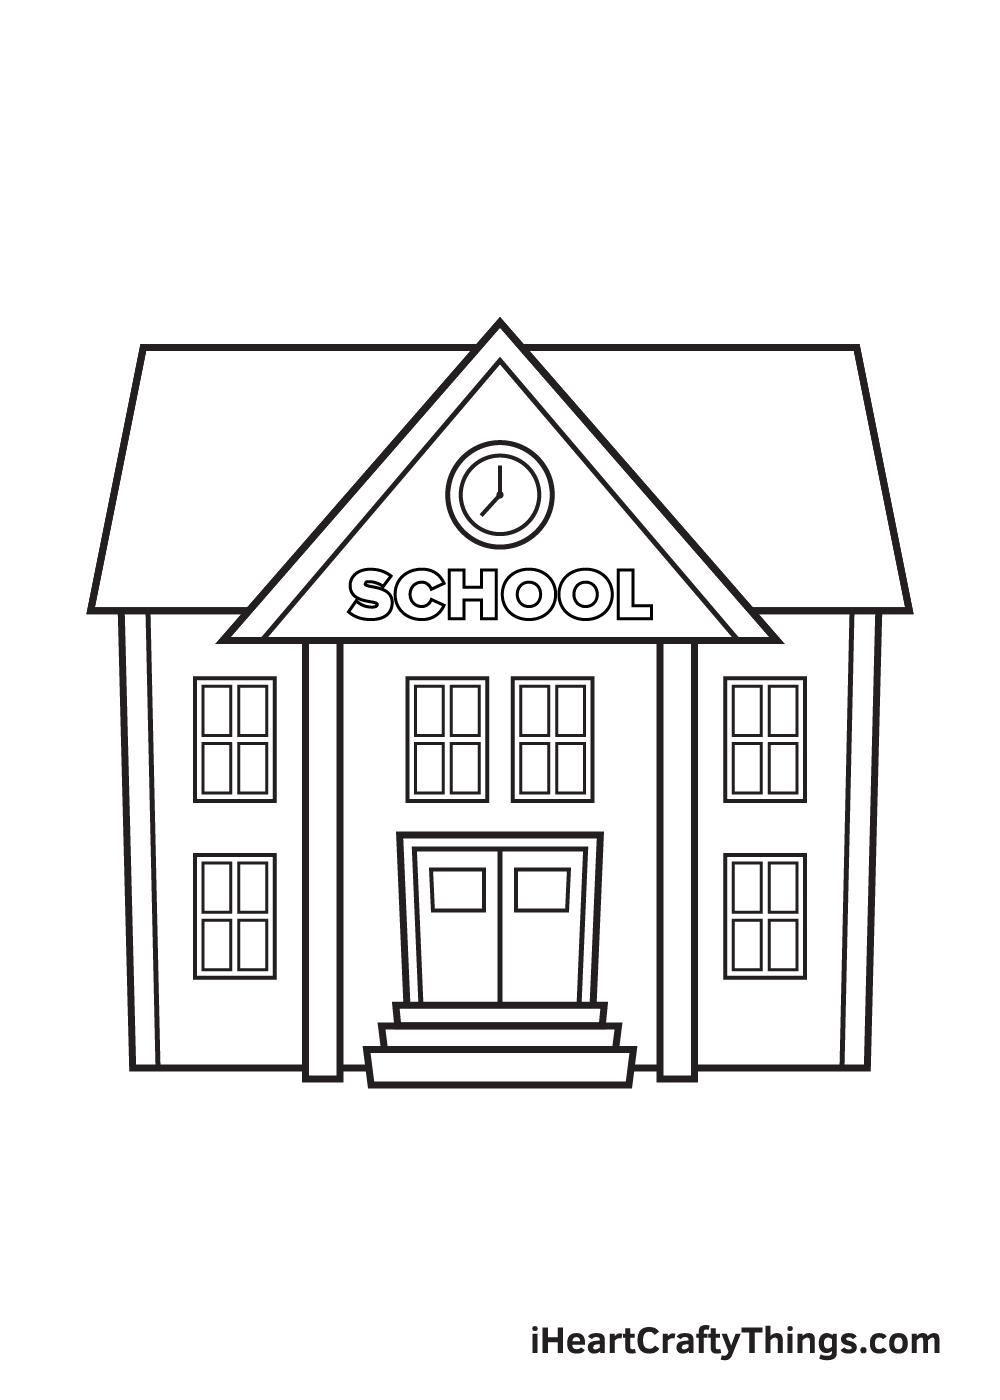 school drawing step 9